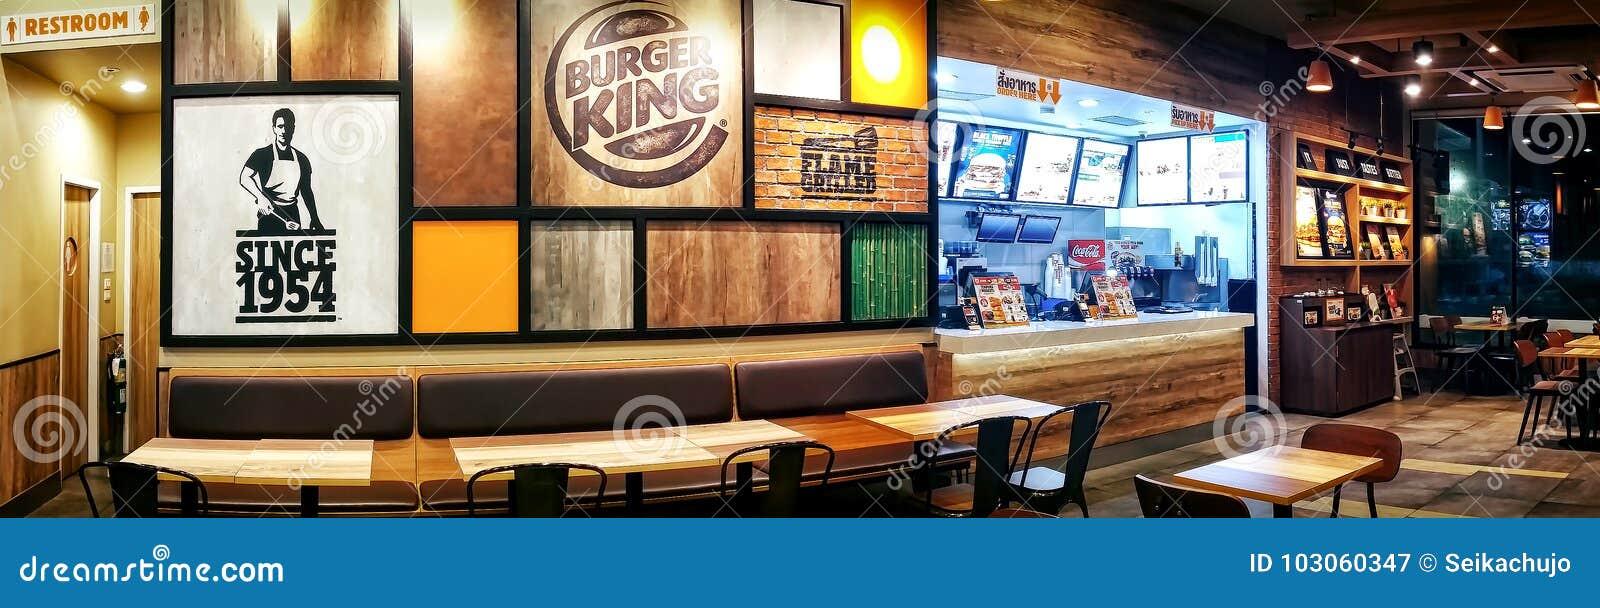 БАНГКОК, ТАИЛАНД - 23-ЬЕ ОКТЯБРЯ: Пустое stor фаст-фуда Burger King